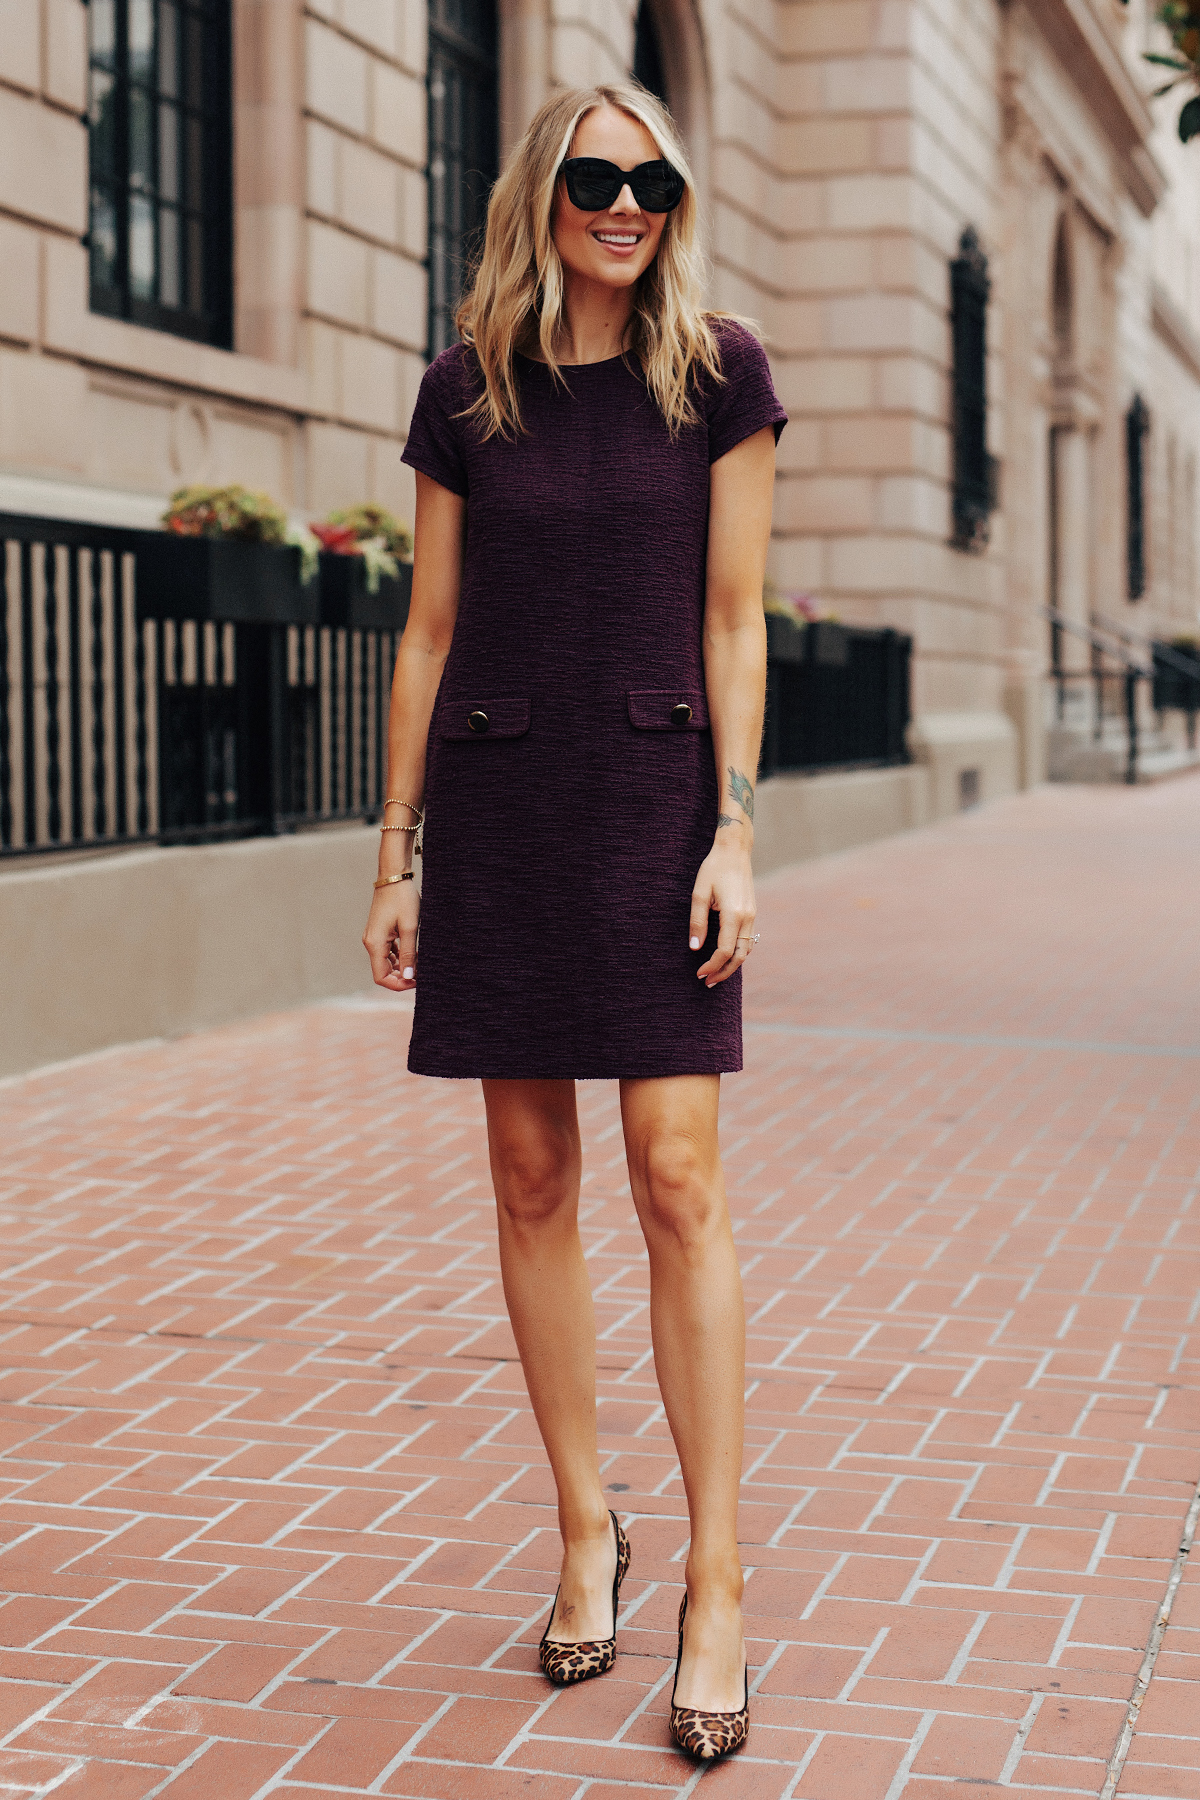 Fashion Jackson Wearing Ann Taylor Plum Tweed Shift Dress Leopard Pumps Fall Workwear Outfit